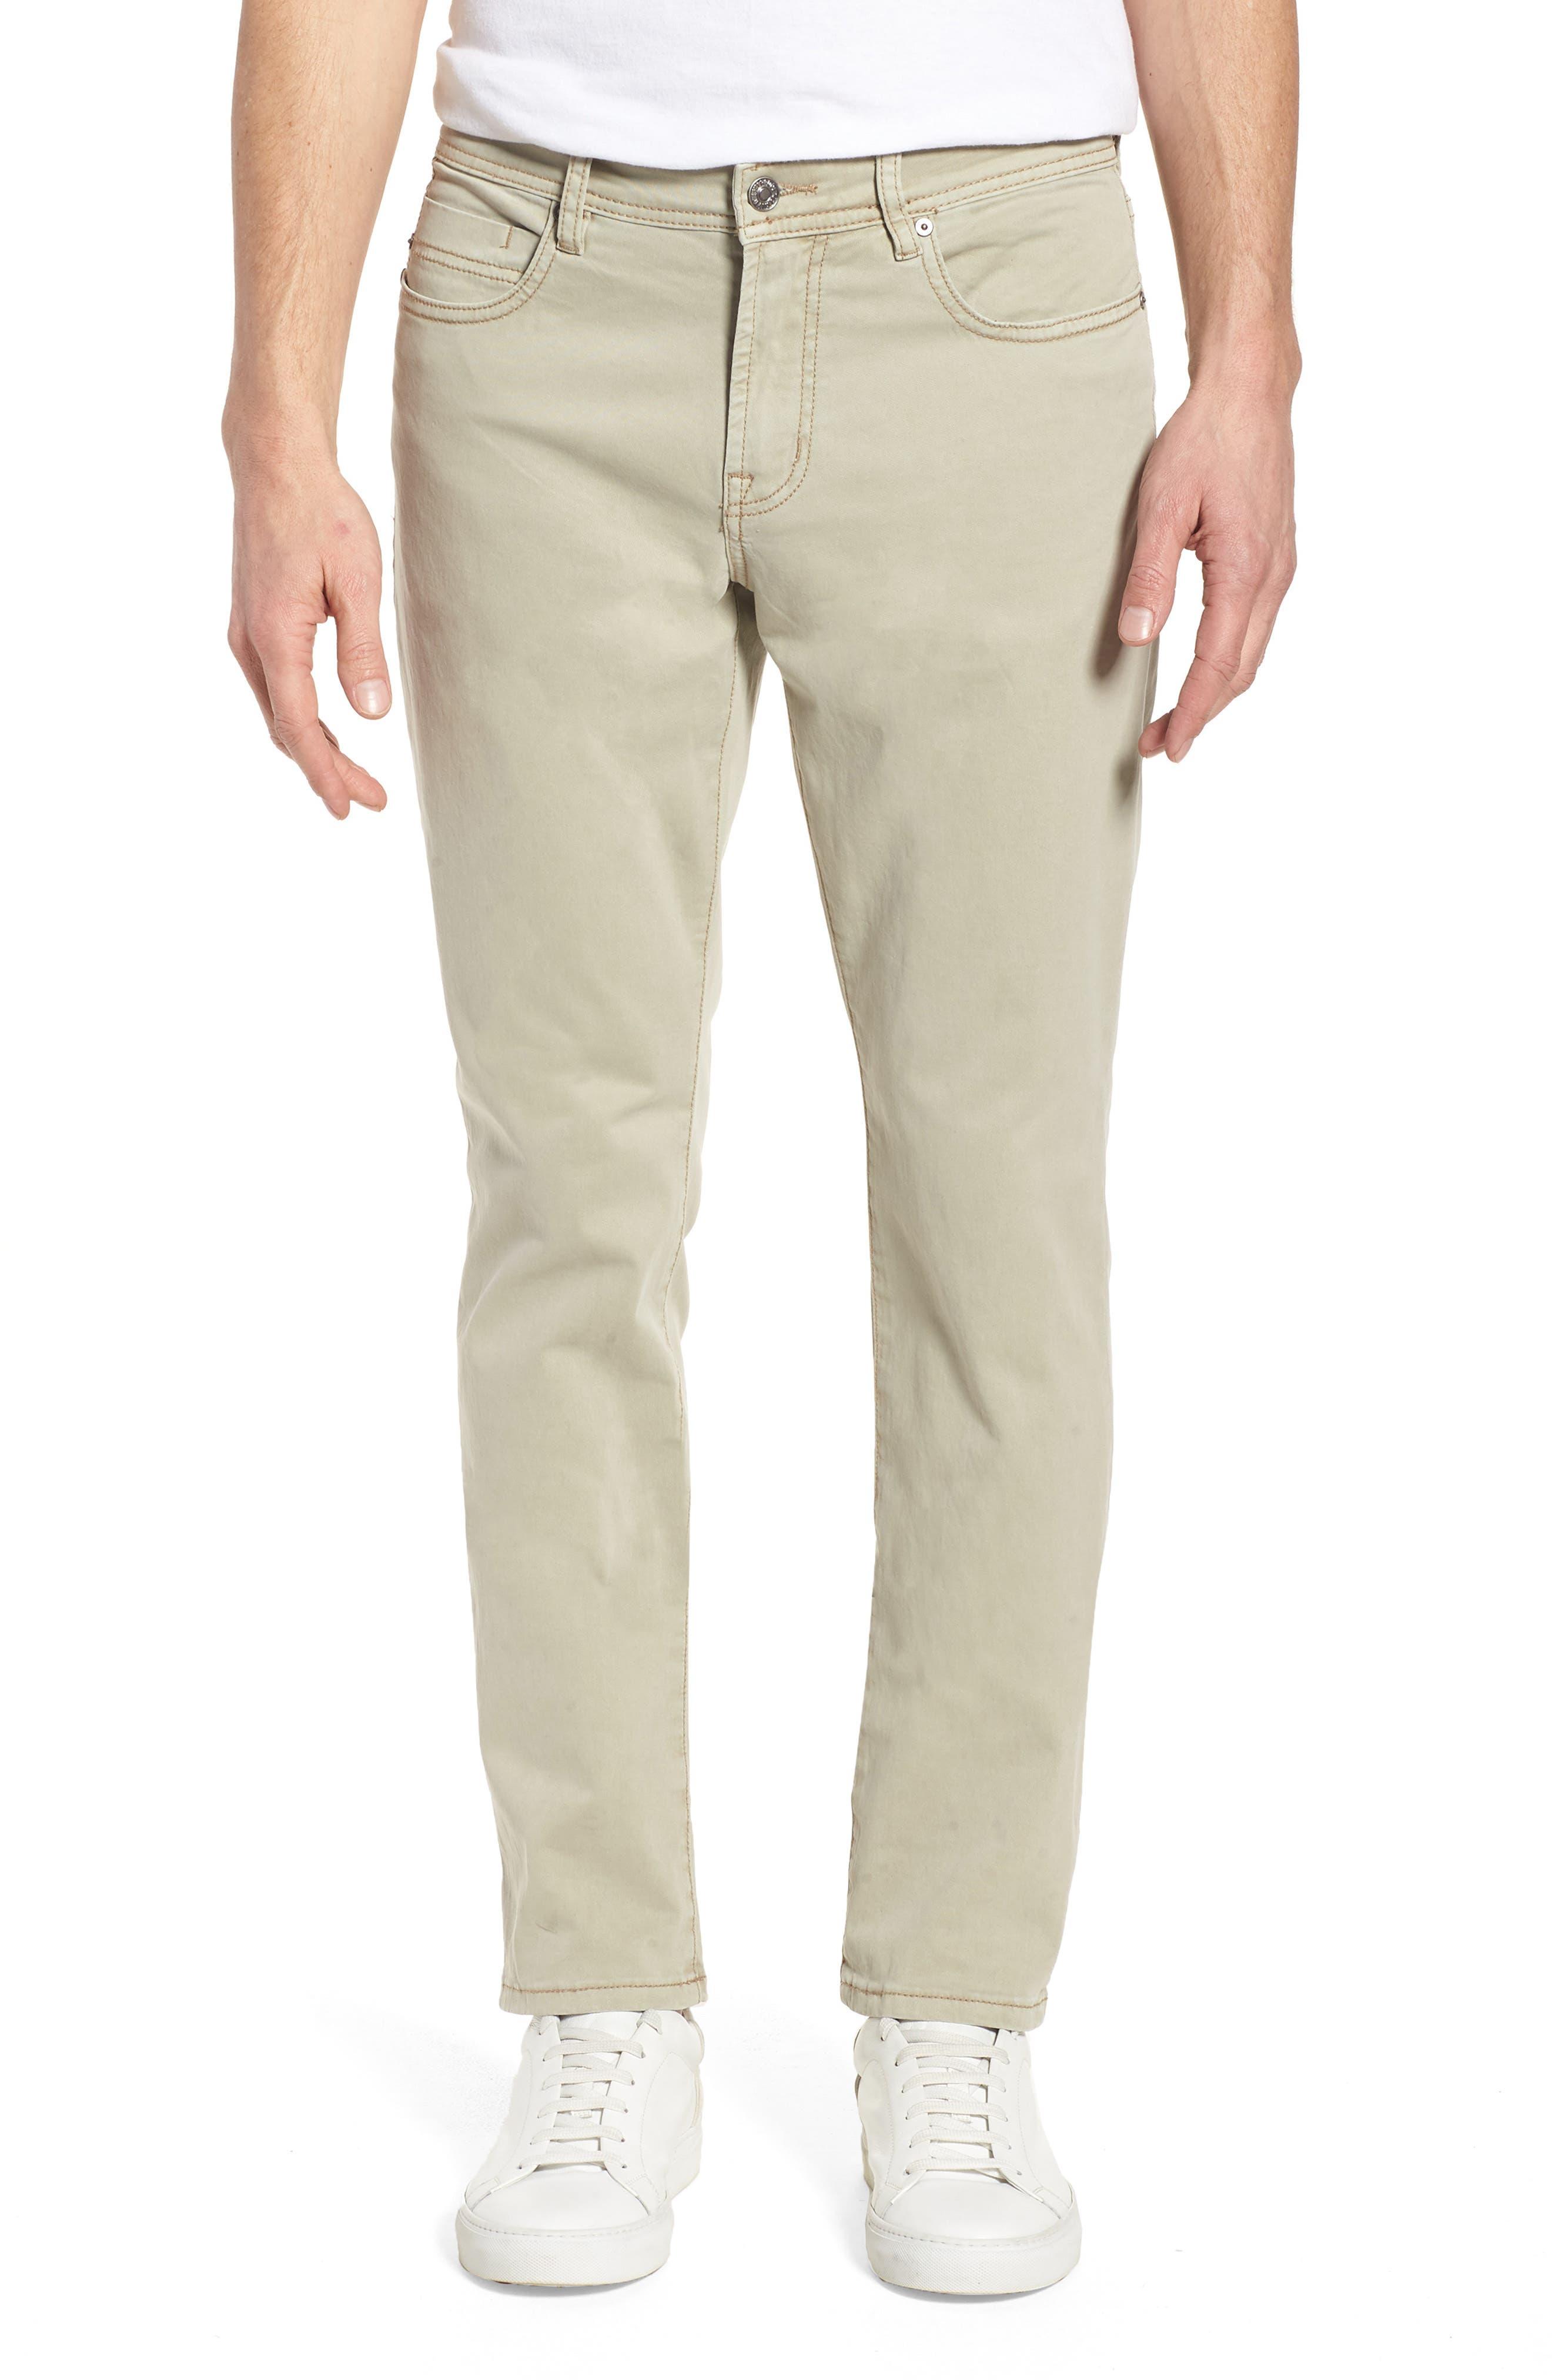 Liverpool Jeans Co. Slim Straight Leg Jeans (Sandstorm)